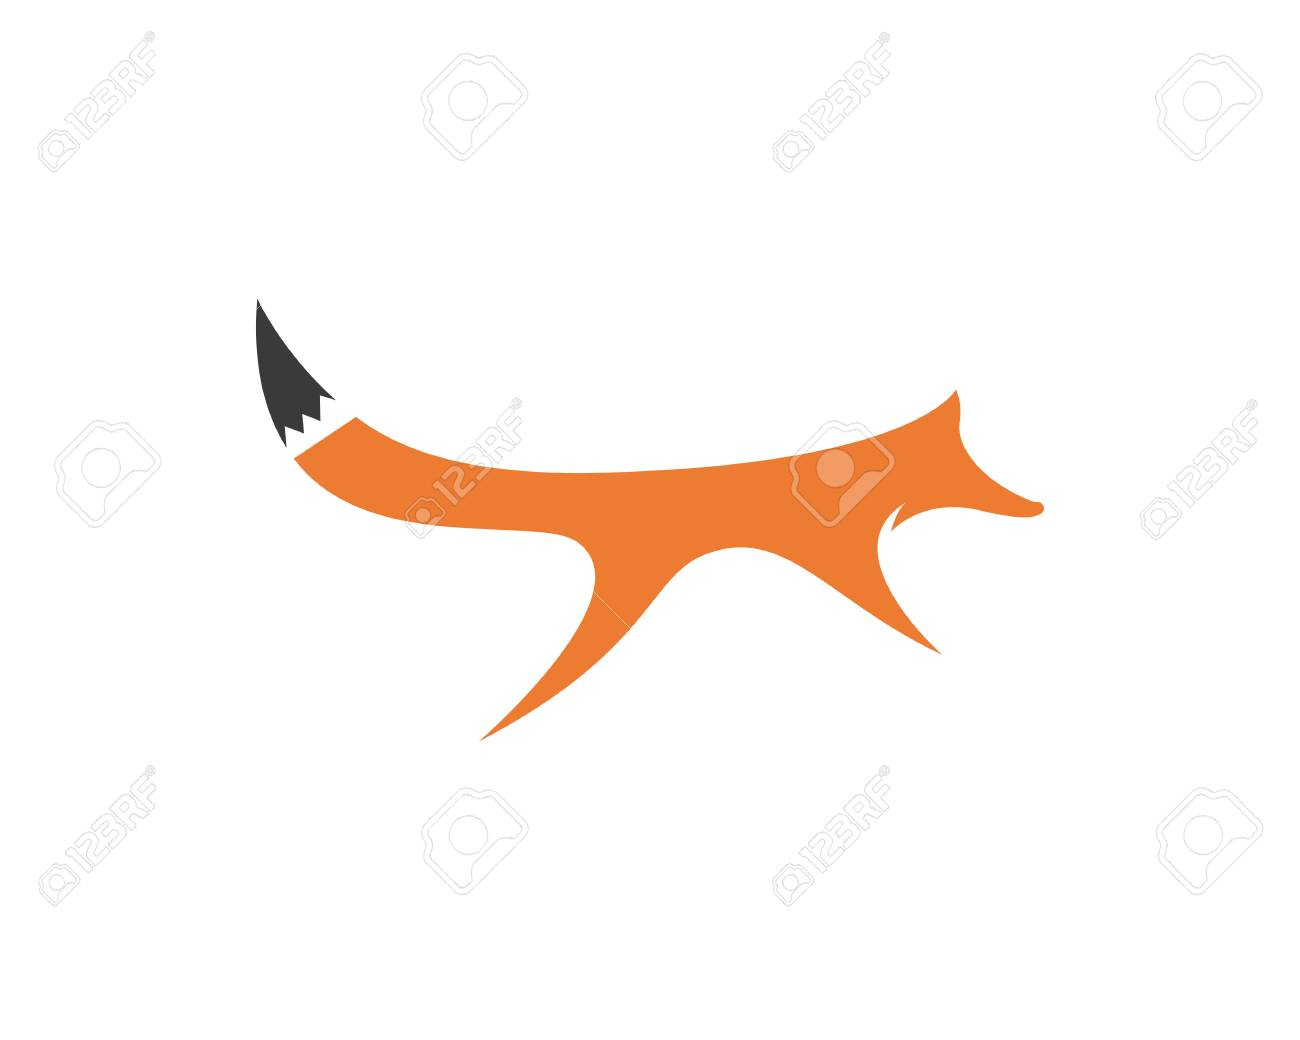 Fox Template | Fox Logo Vector Ilustration Template Lizenzfrei Nutzbare